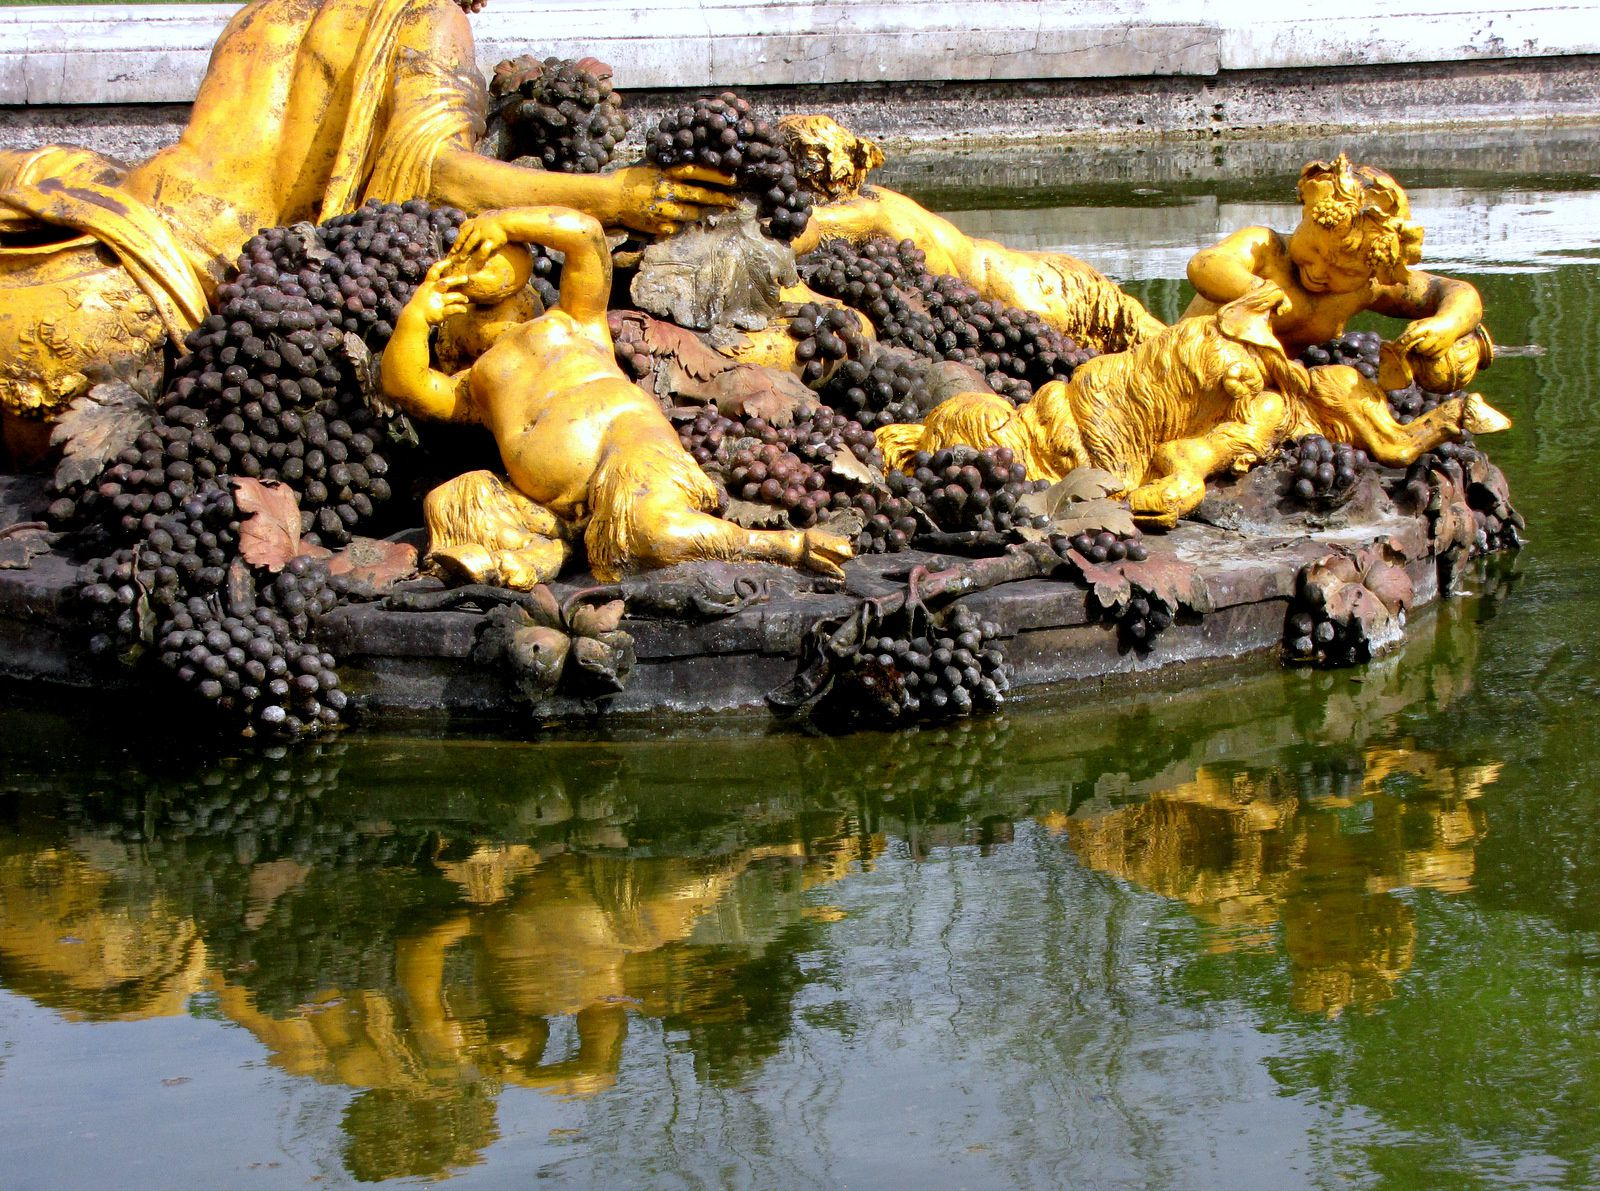 Bassin de Bacchus